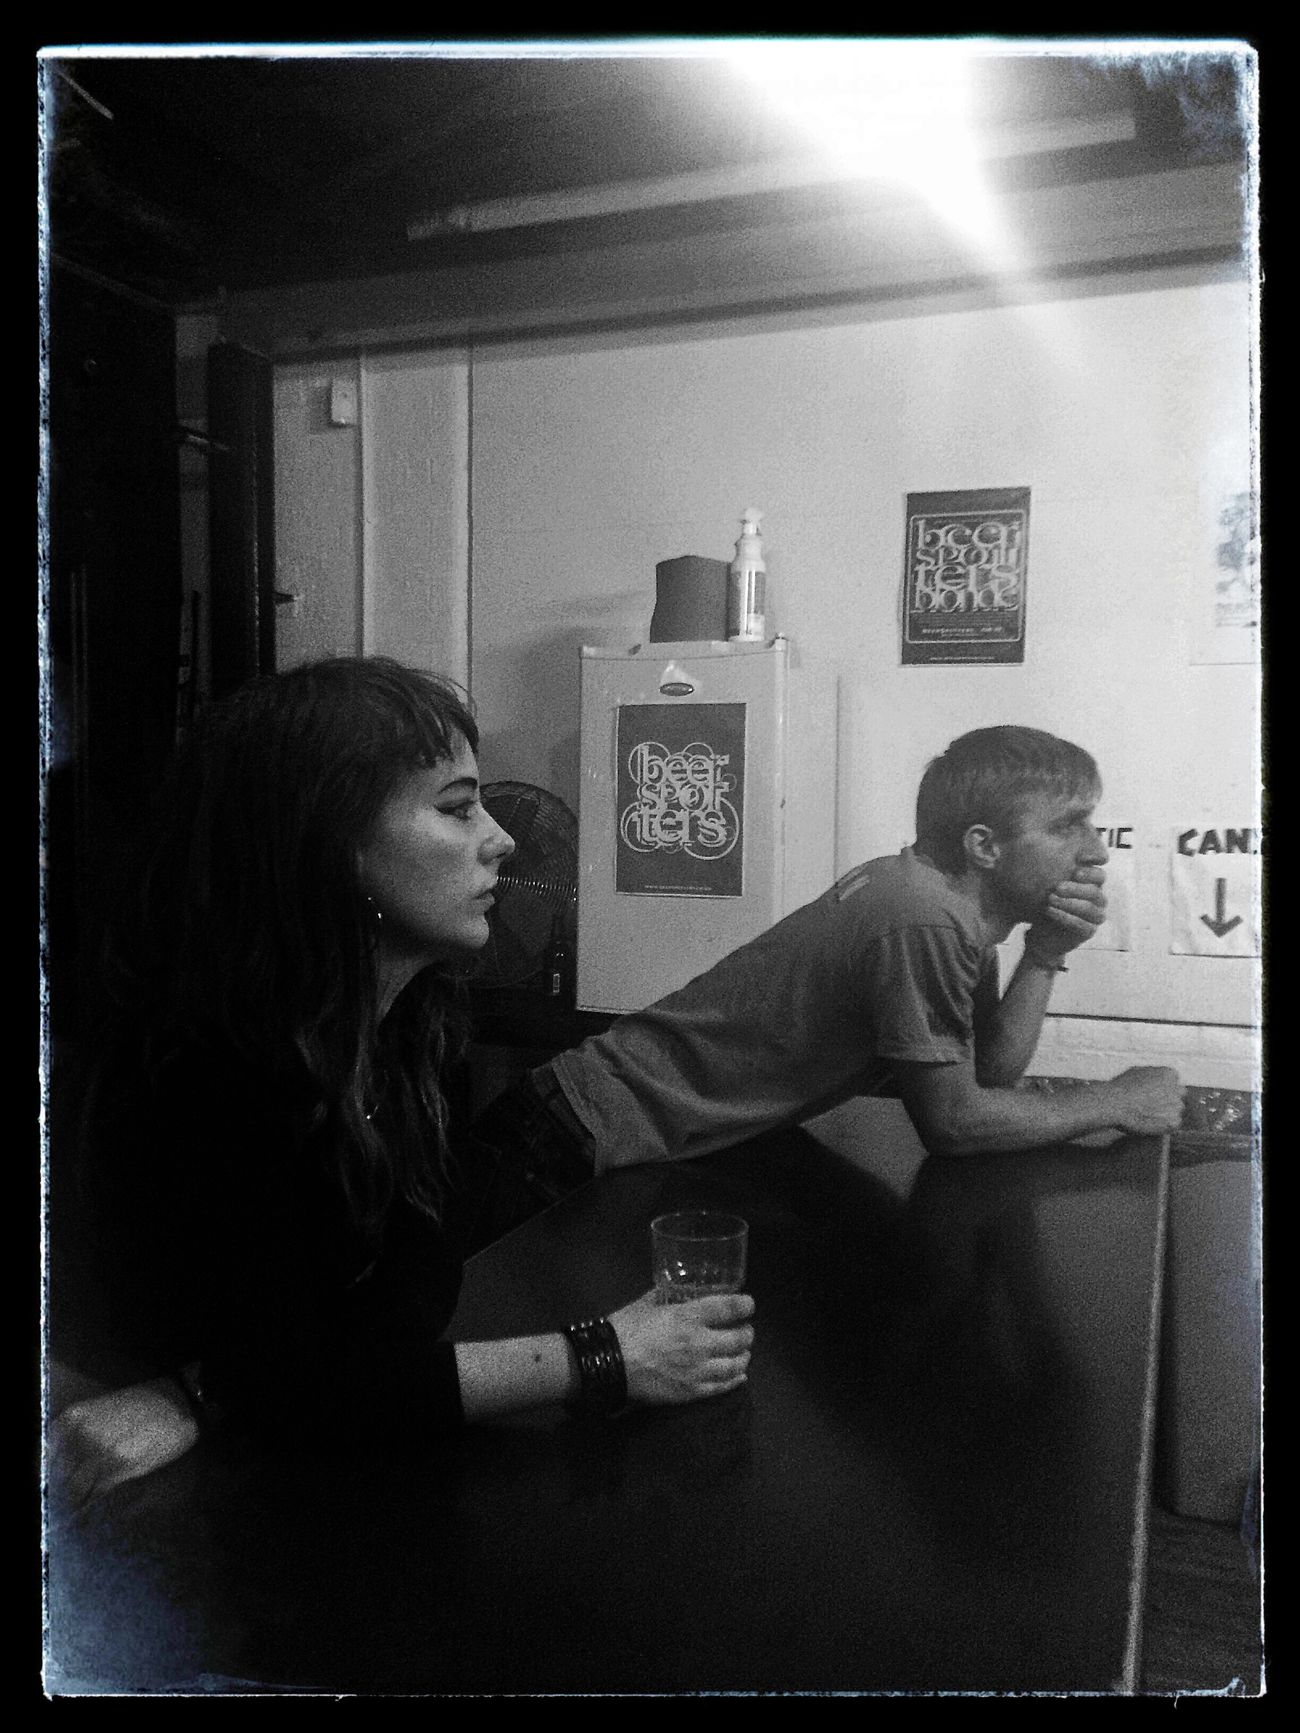 People Photography Bar Black And White Photography Blackandwhite Black And White Amateurphotography Kraak Gallery Manchester Homoelectrik